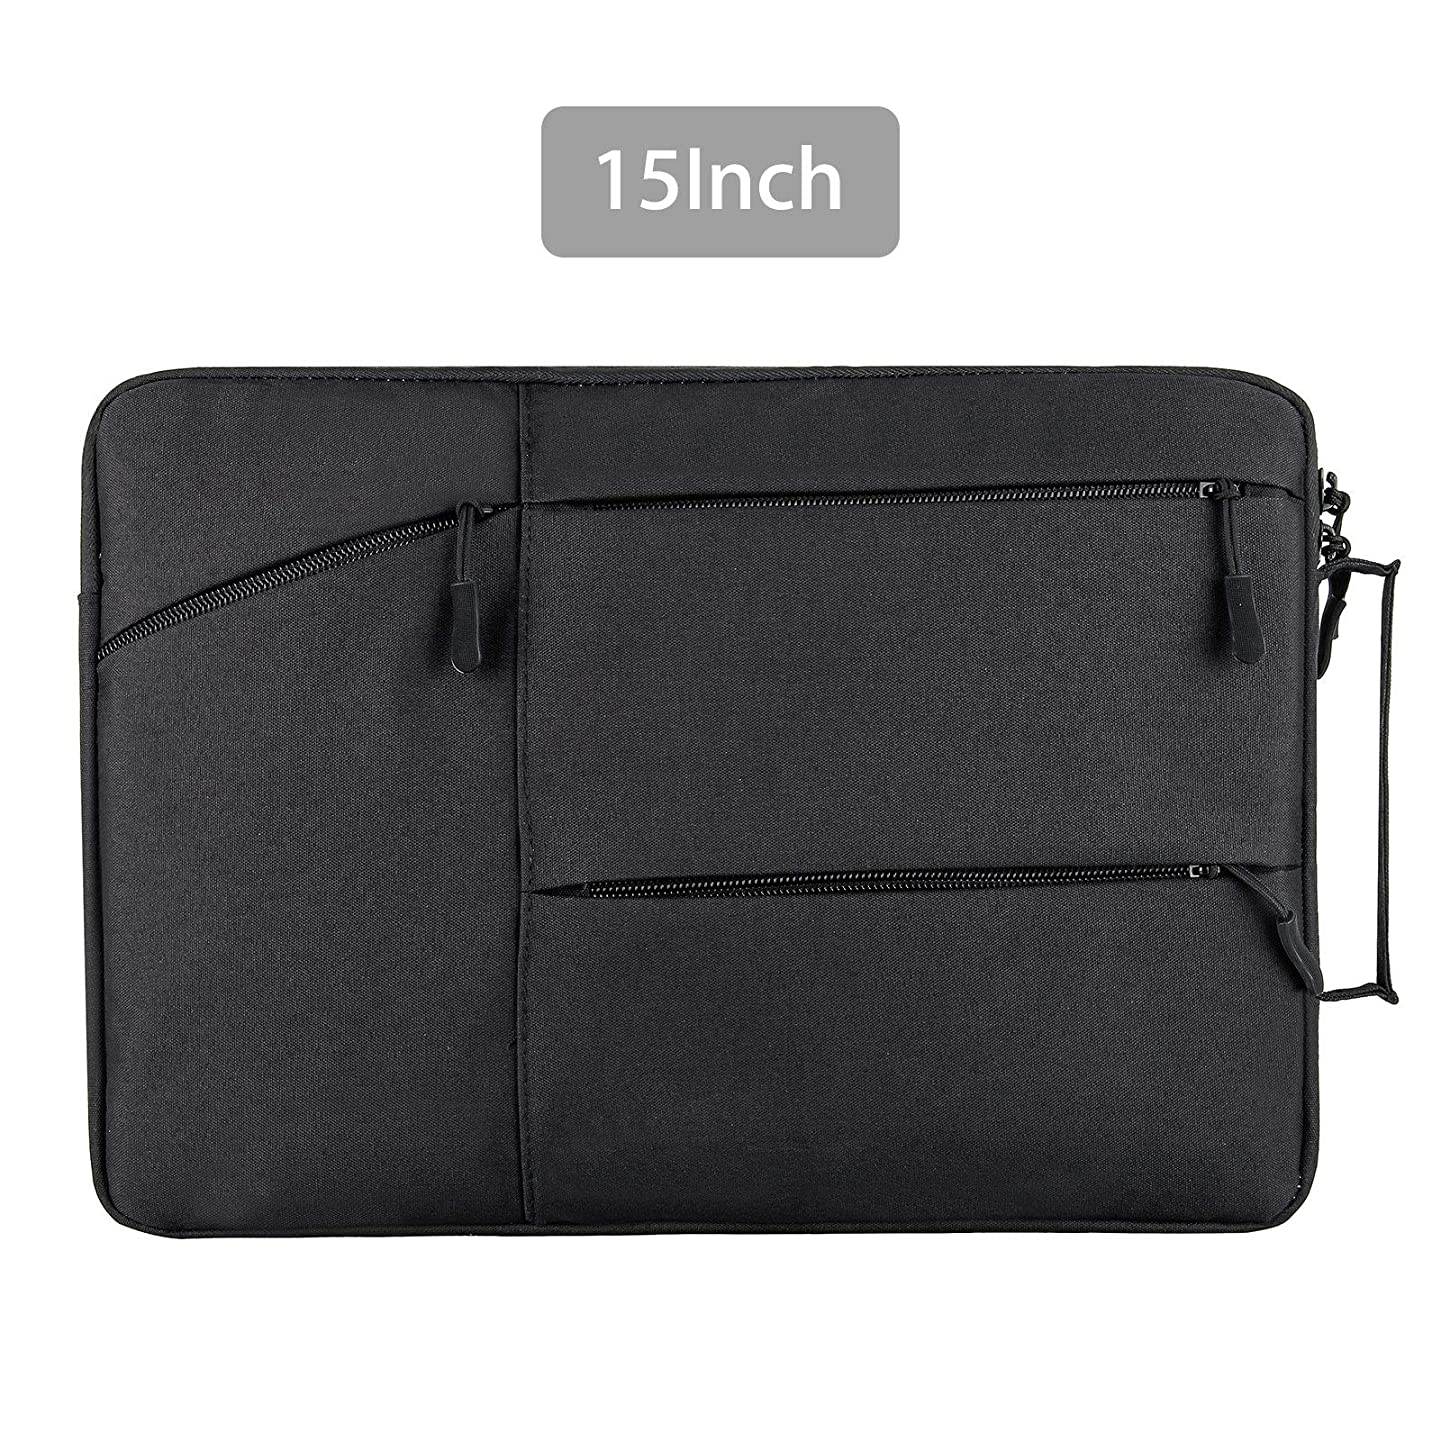 EEEKit 15 Inch Waterproof Laptop Sleeve Bag with Handle for Acer Chromebook R11, Samsung Chromebook 3, HP Stream 11/Chromebook 11, Lenovo 11.6 Chromebook, 11.6 inch Notebook Protective Bag, Black